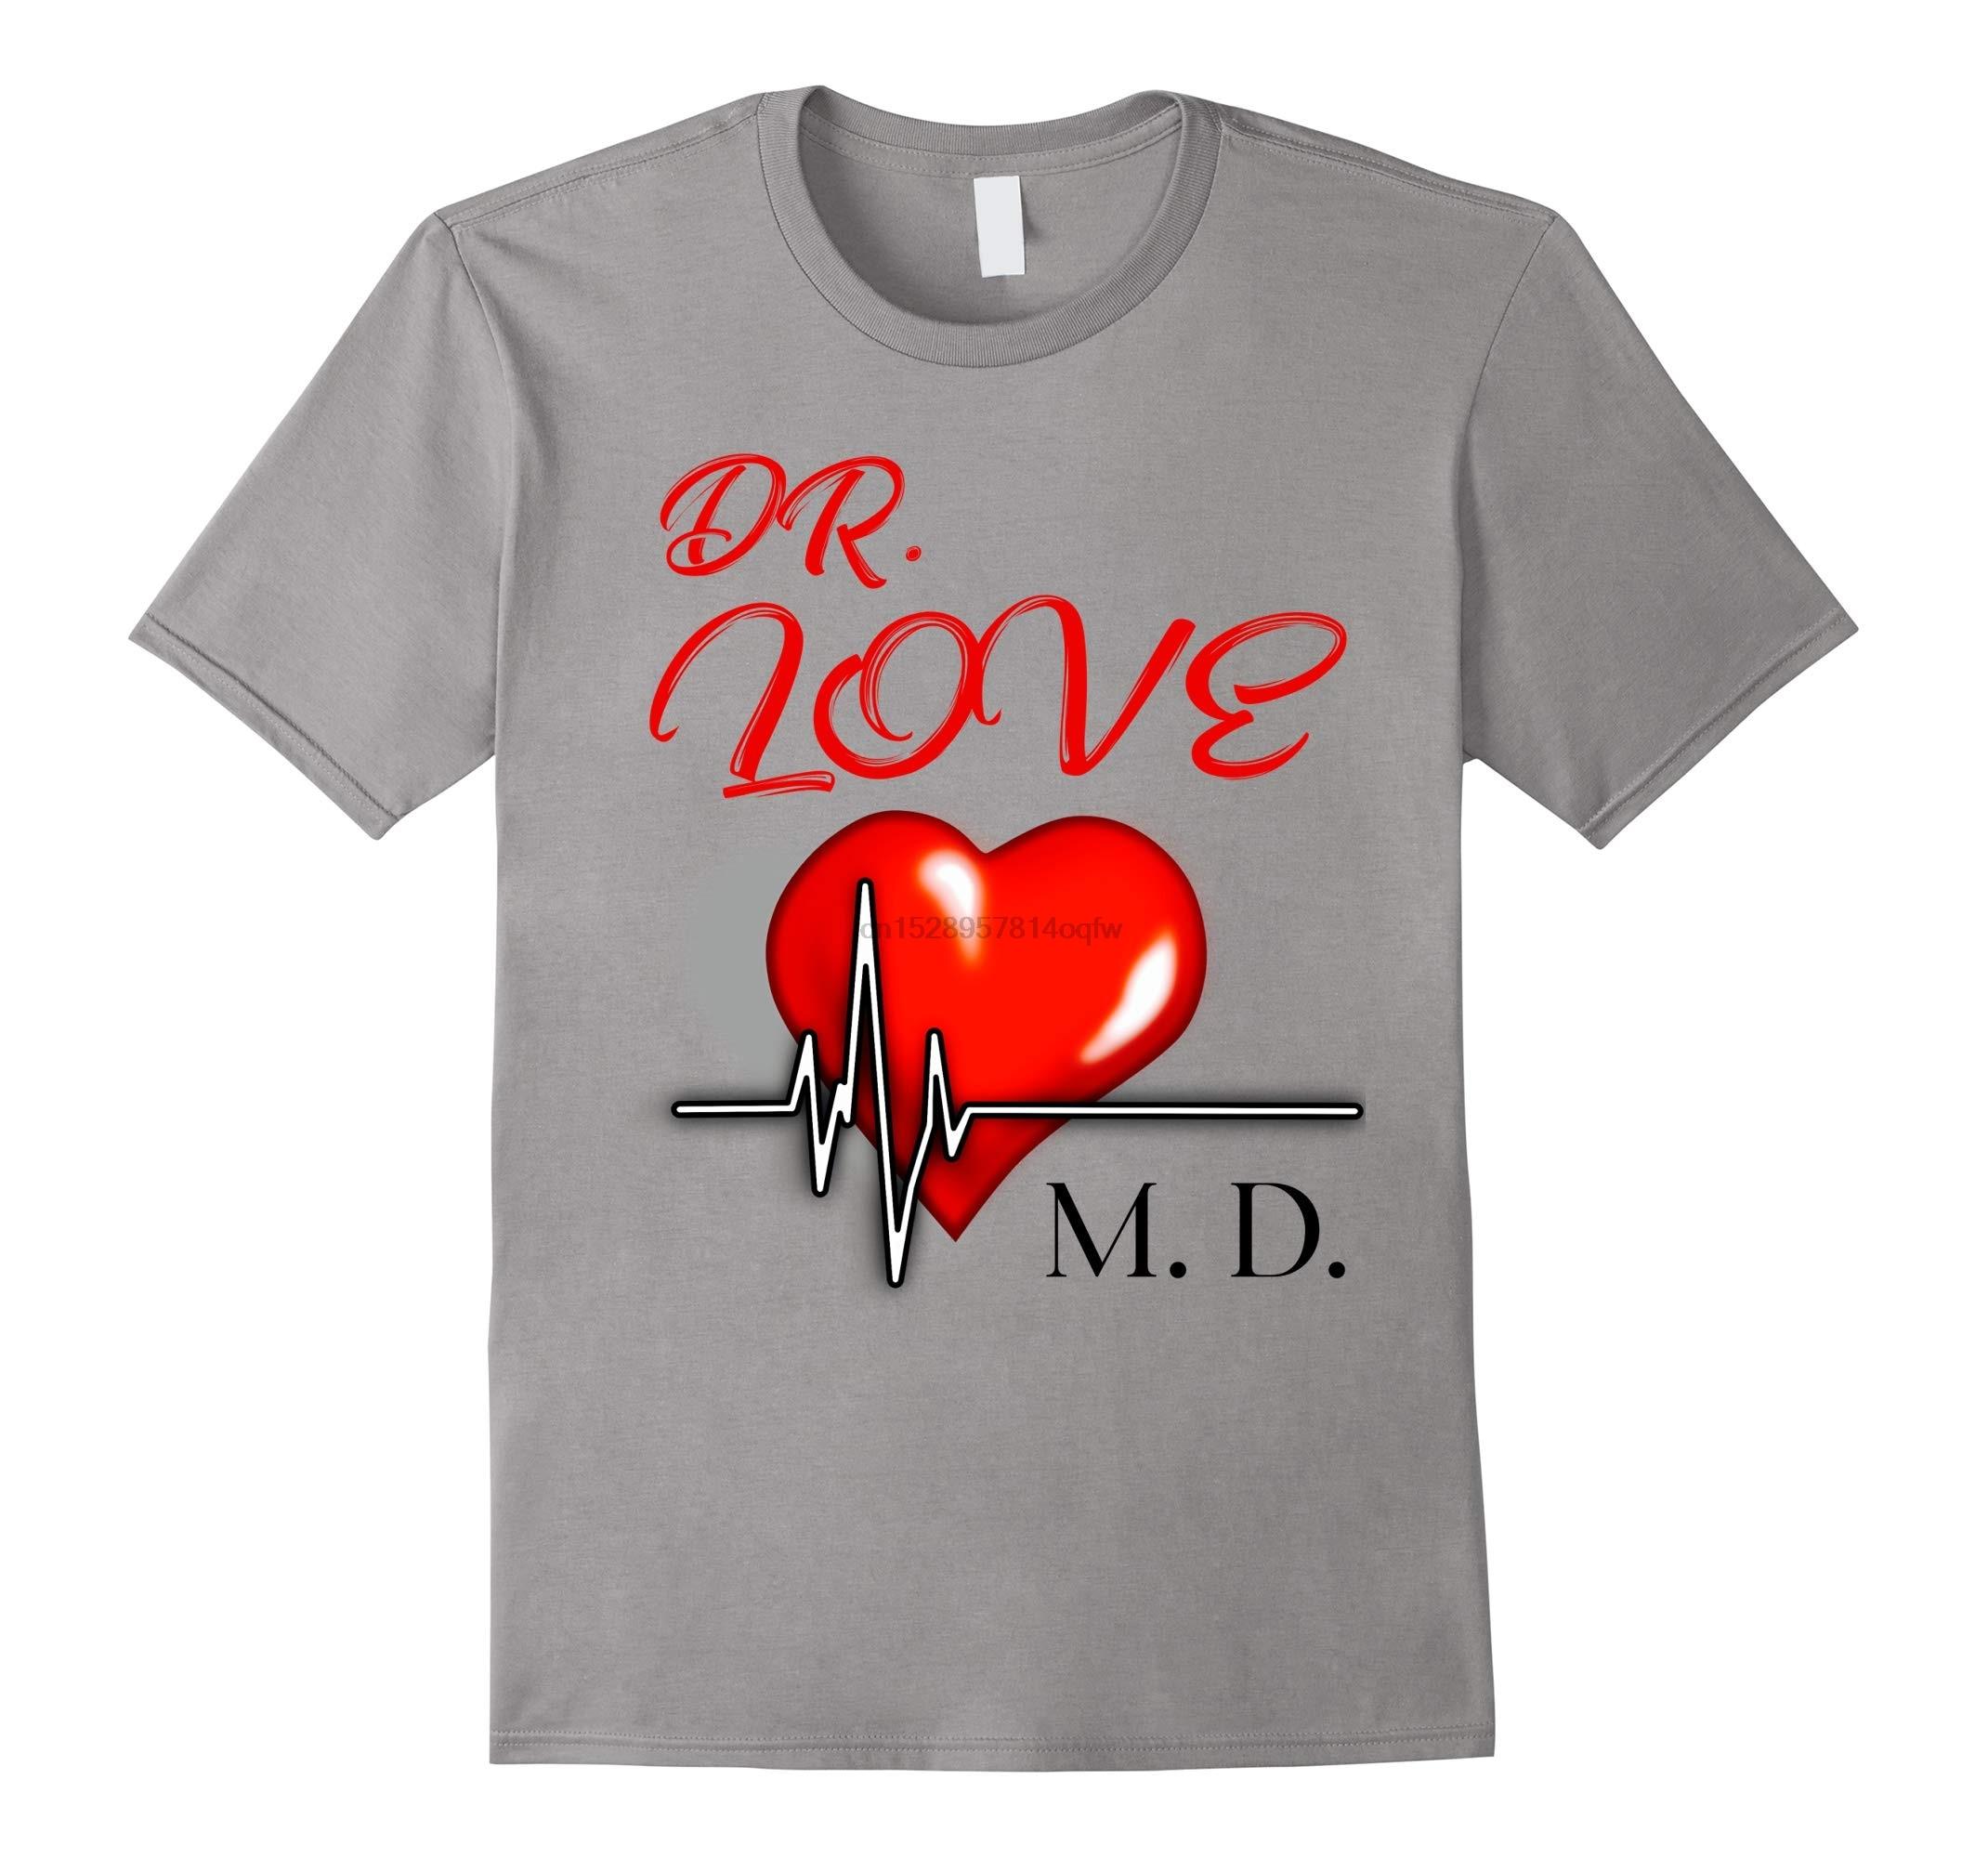 Men t shirt Dr Love MD Cute Heart Valentines Day Novelty T-Shirt-RT Women tshirts